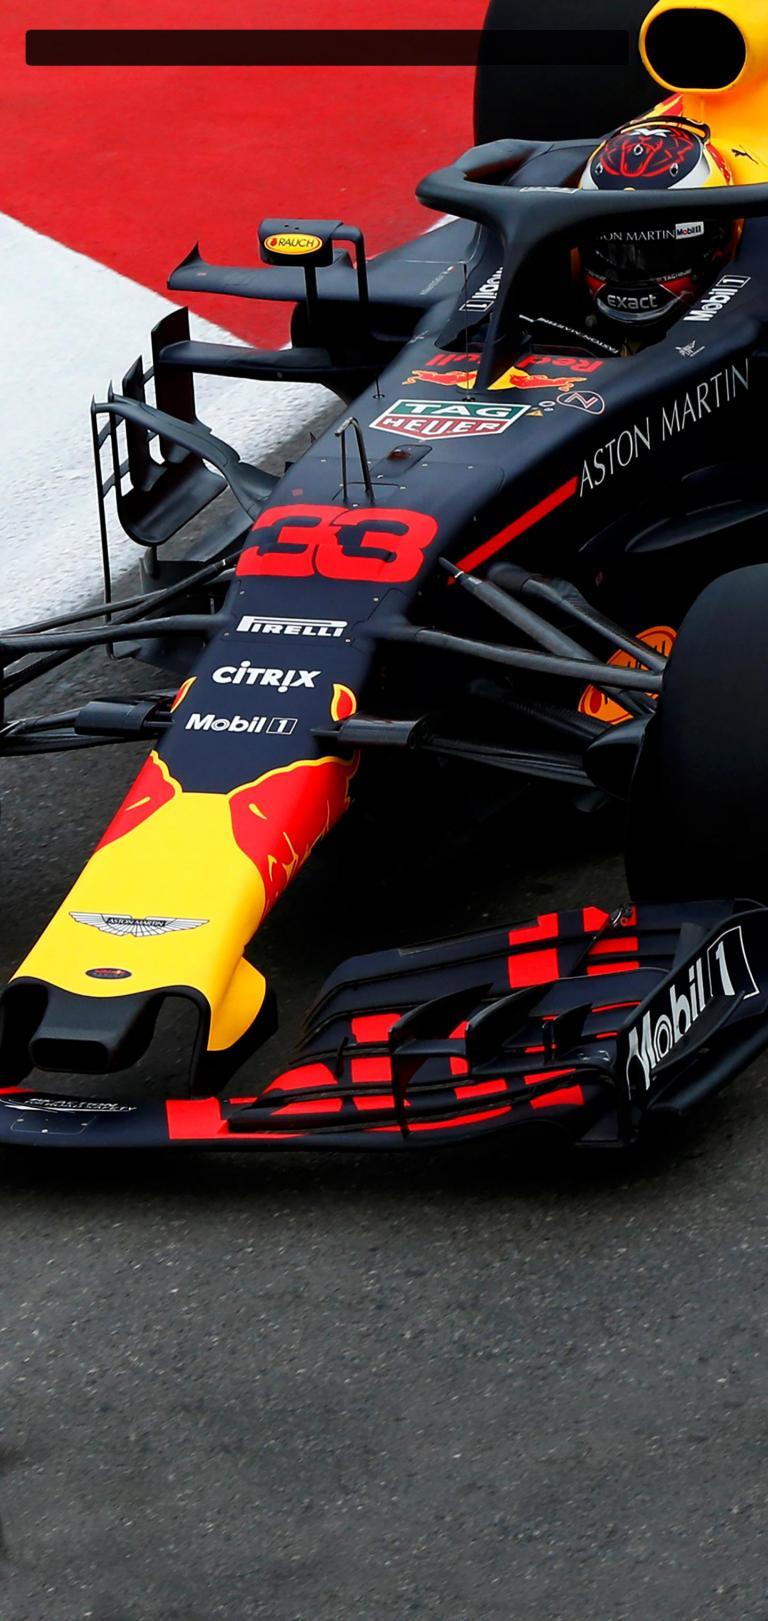 Red Bull F1 Racing By Mbeats85 Galaxy S10 Wallpaper Red Bull F1 Red Bull Racing F1 Racing